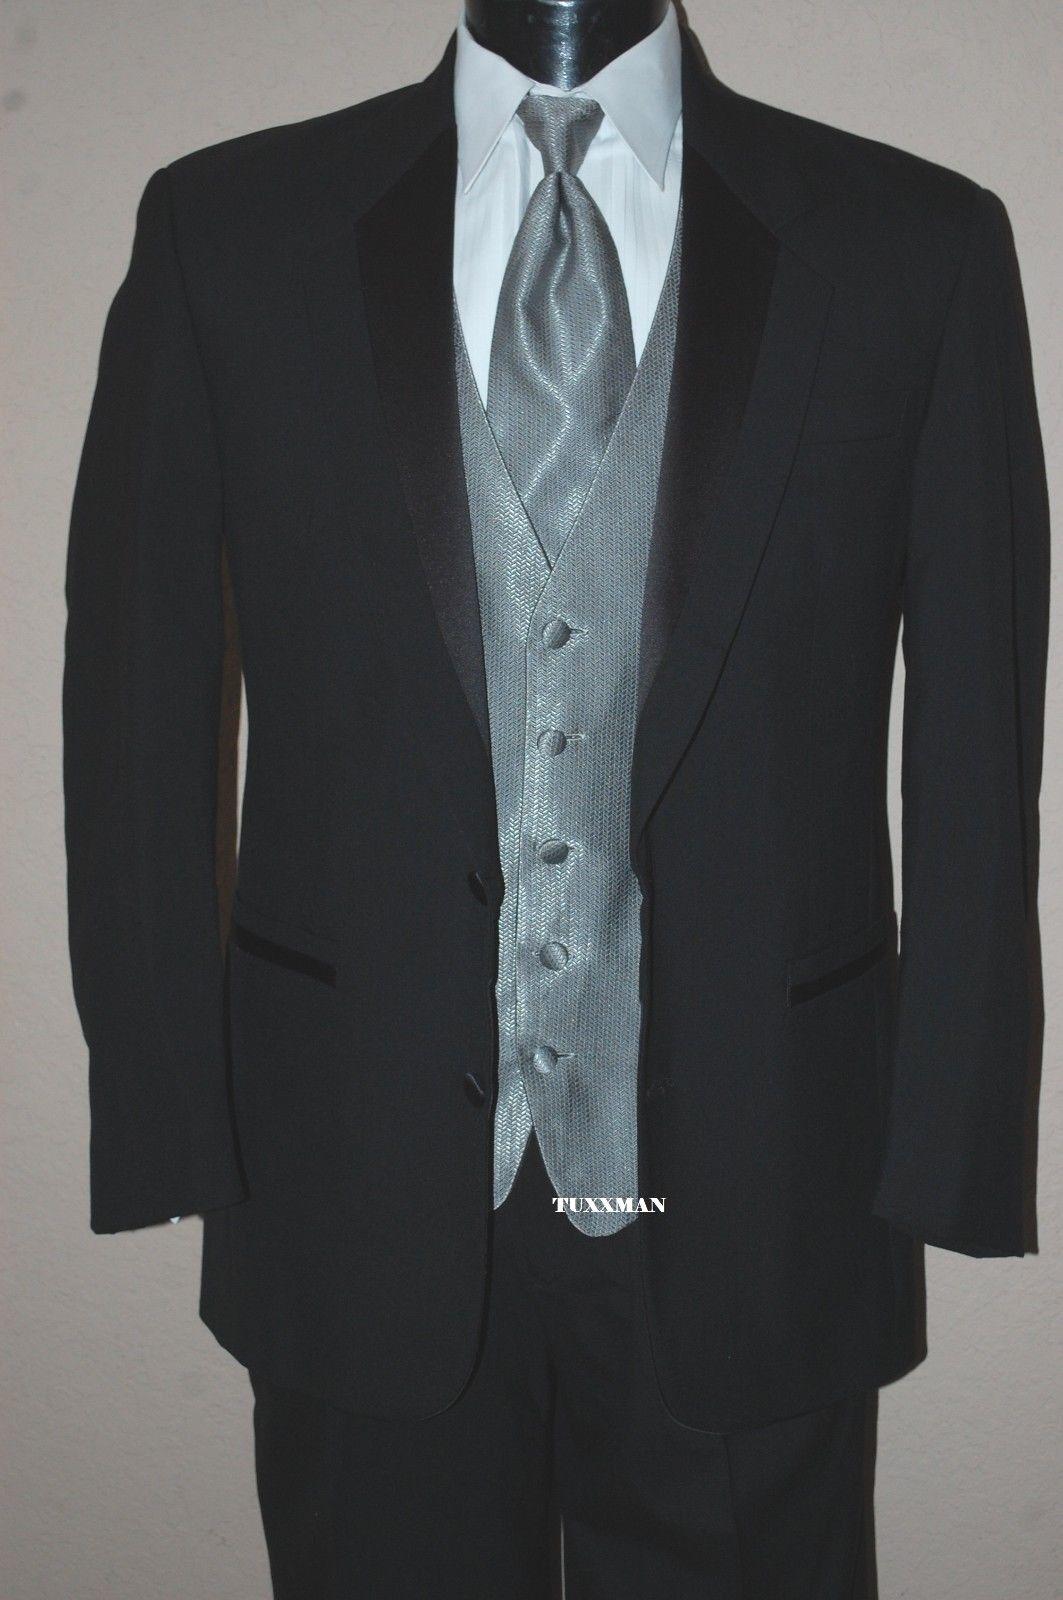 40 R Black 2 button Notch Tuxedo Wool Coat Pants Shirt Tie Vest Cufflinks Studs